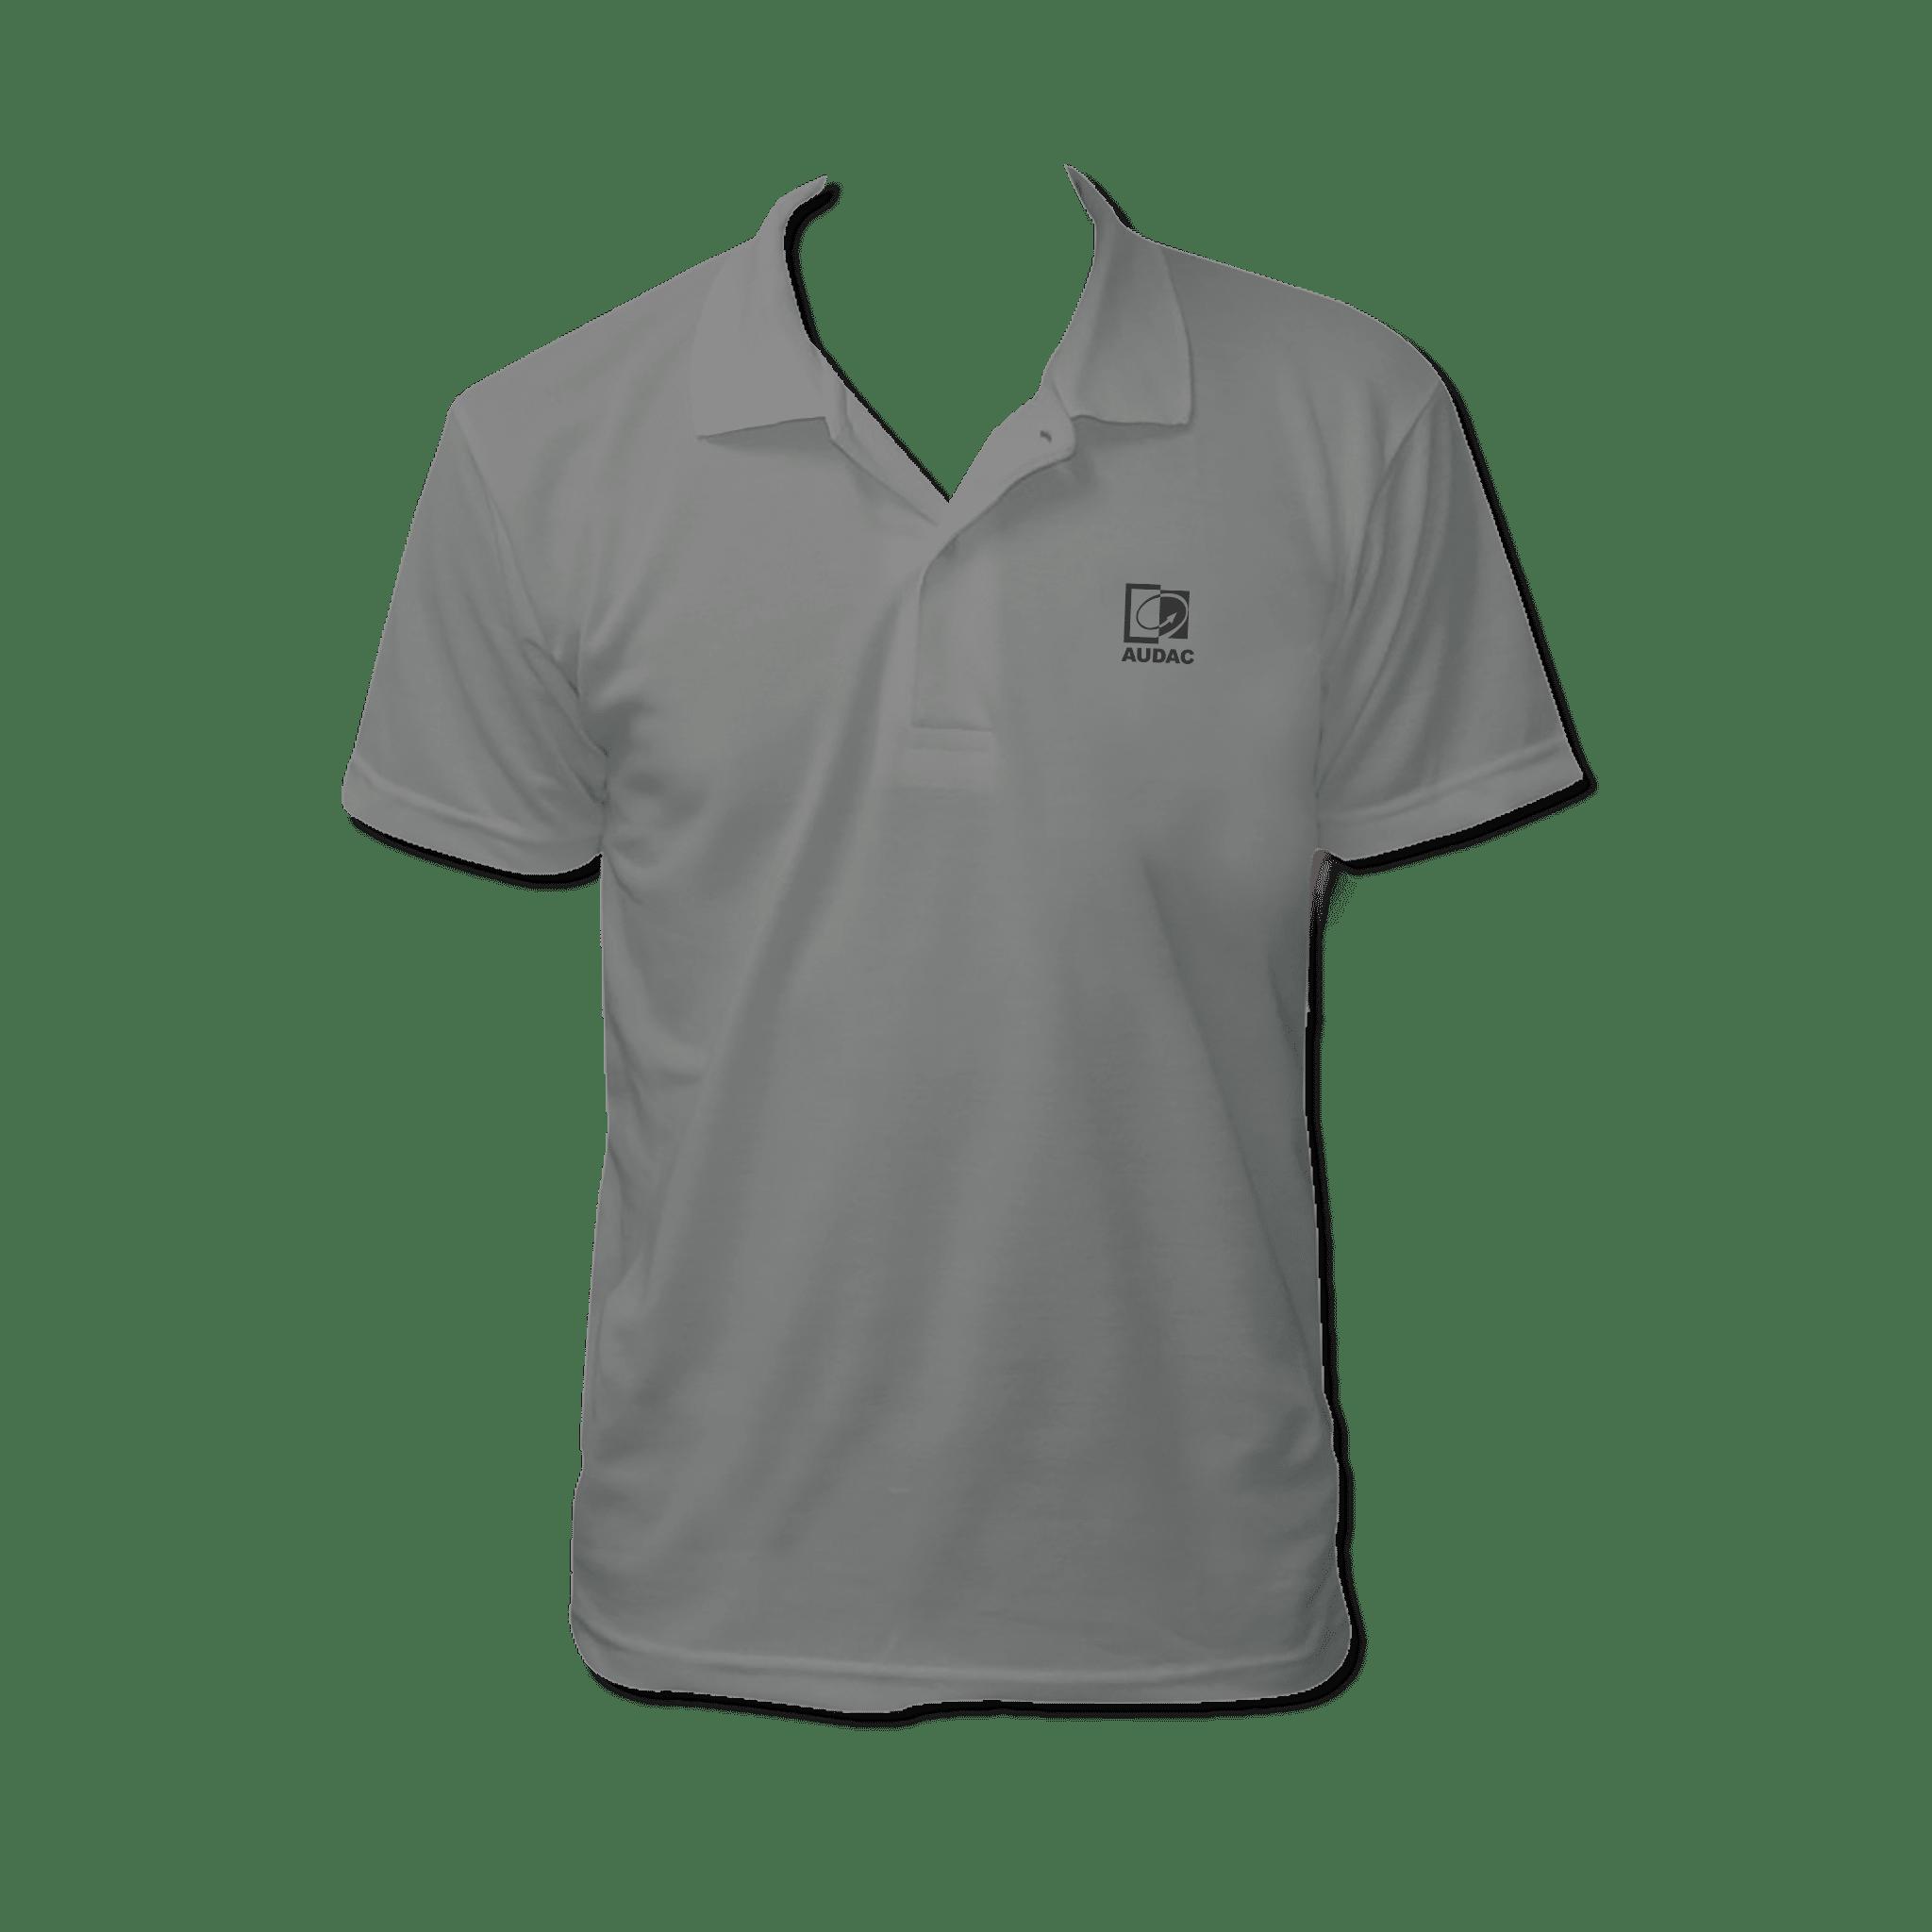 PROMO5081 - AUDAC polo shirt